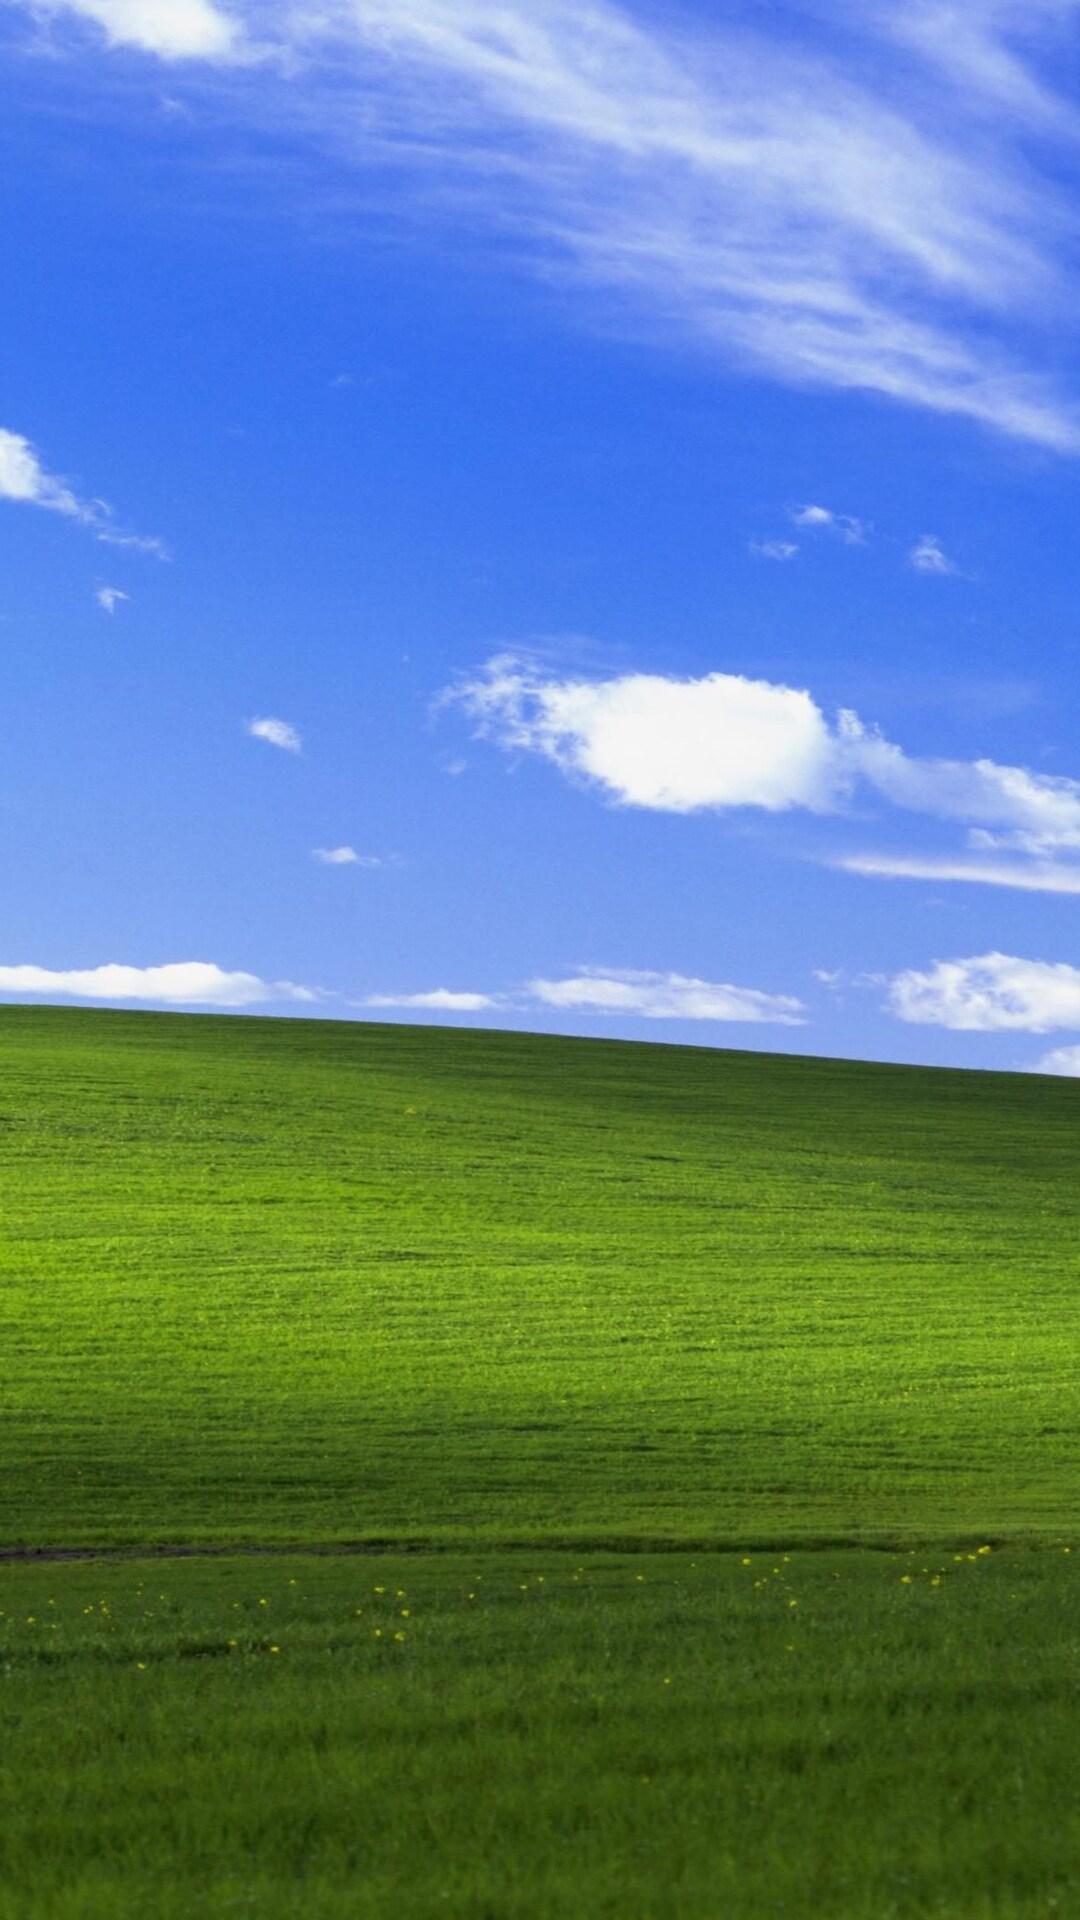 1080x1920 Windows Xp Bliss 4k Iphone 7,6s,6 Plus, Pixel Xl